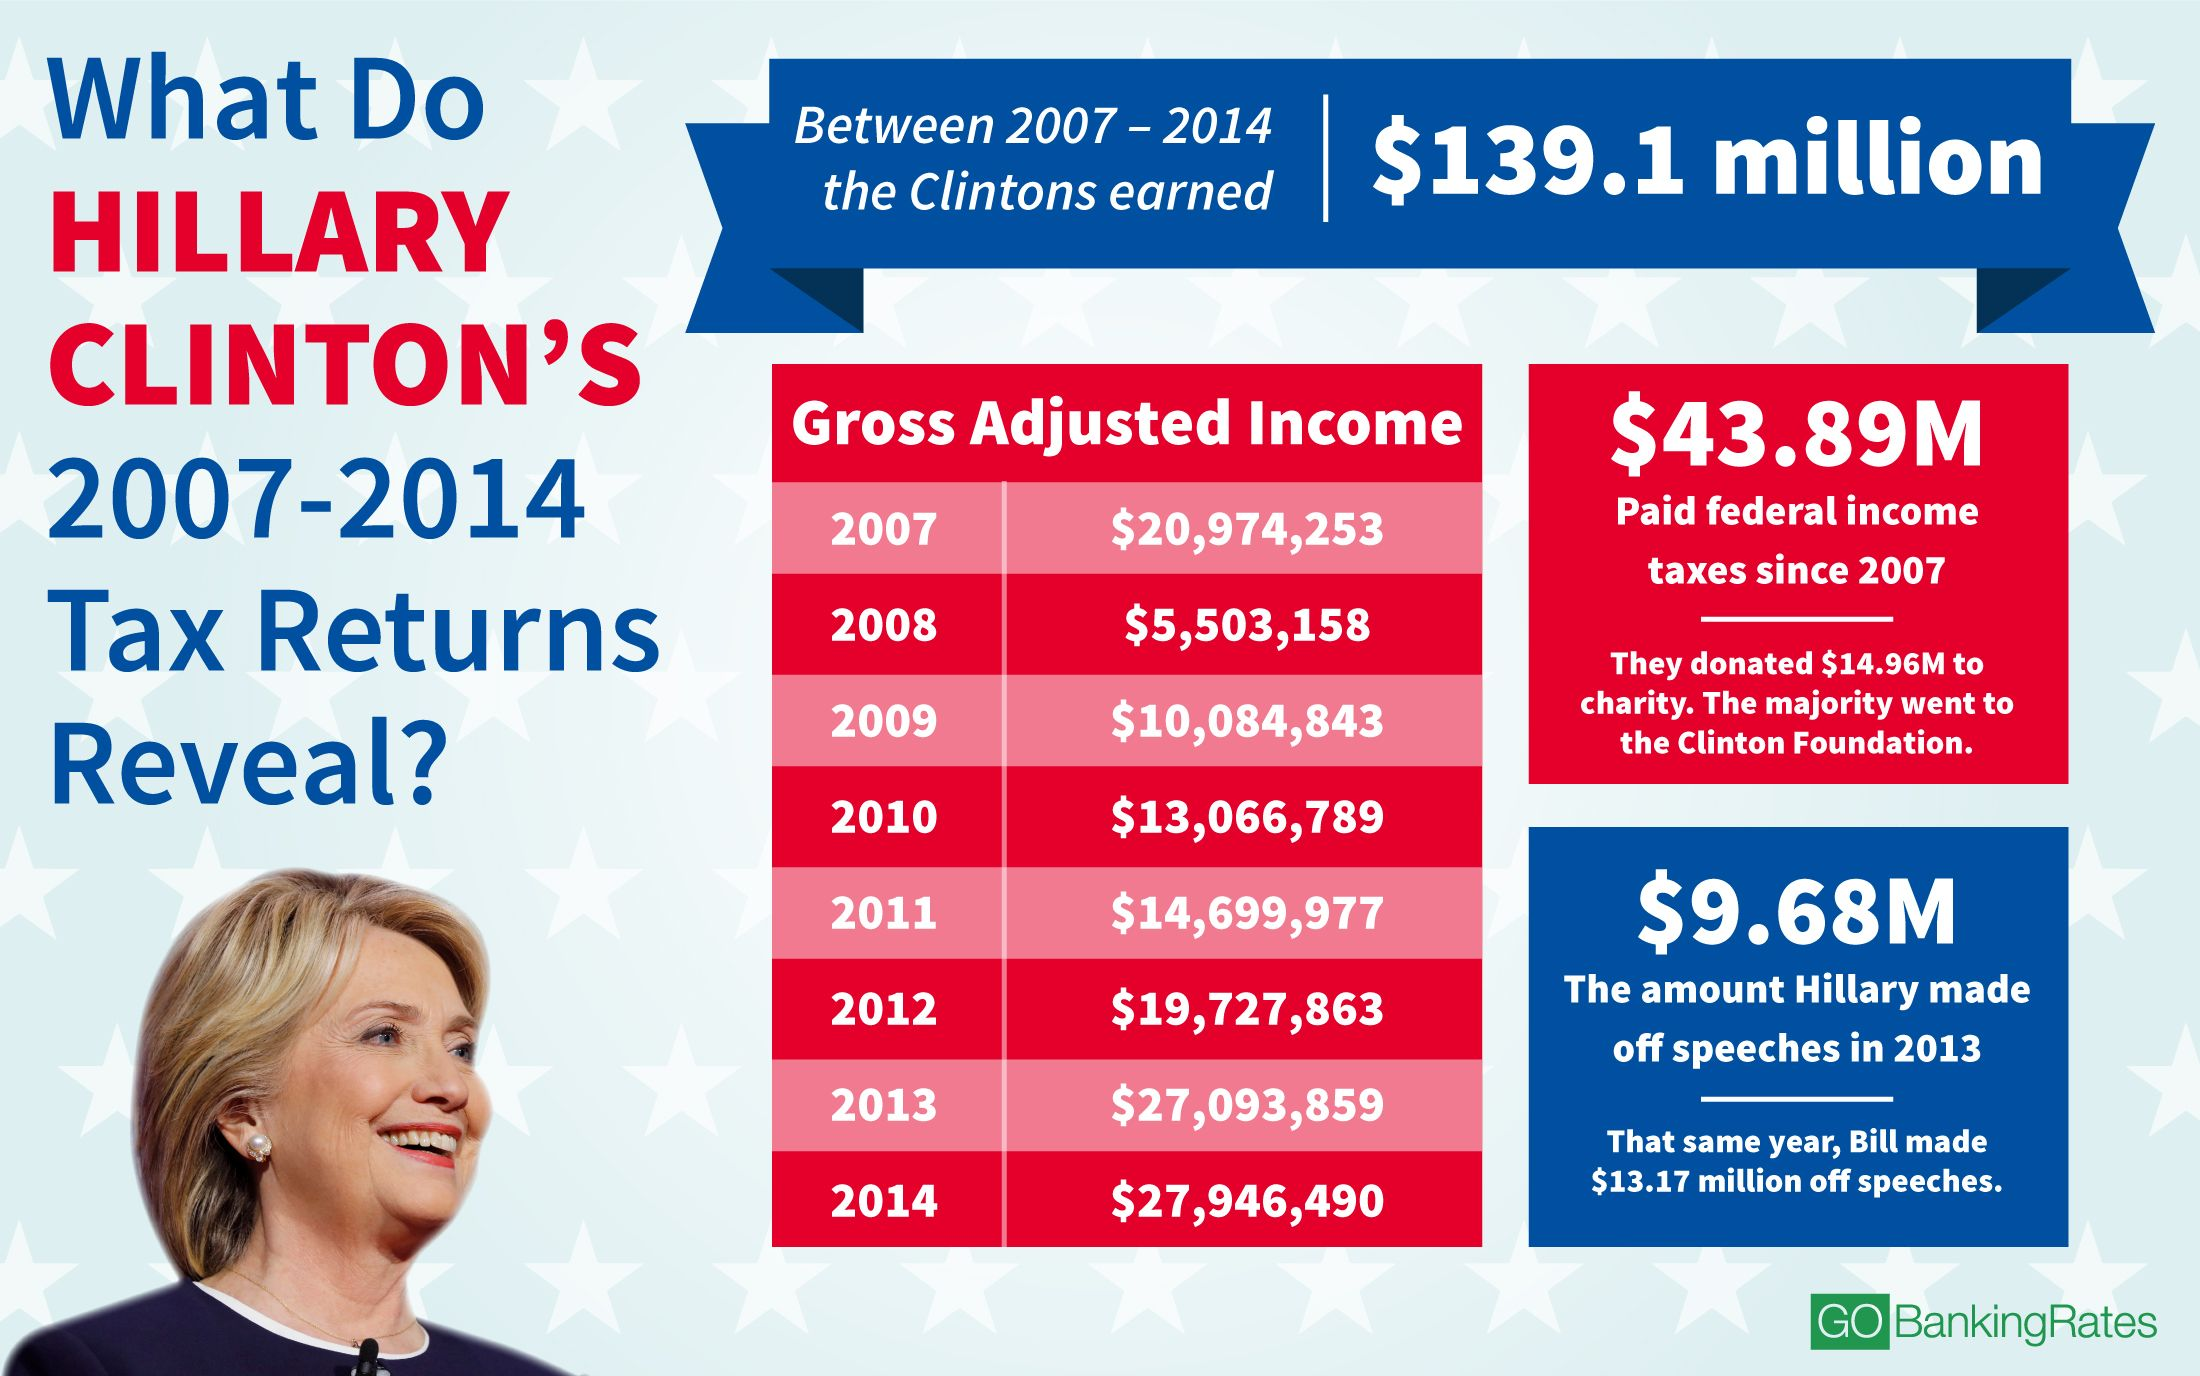 Hillary Clinton tax returns